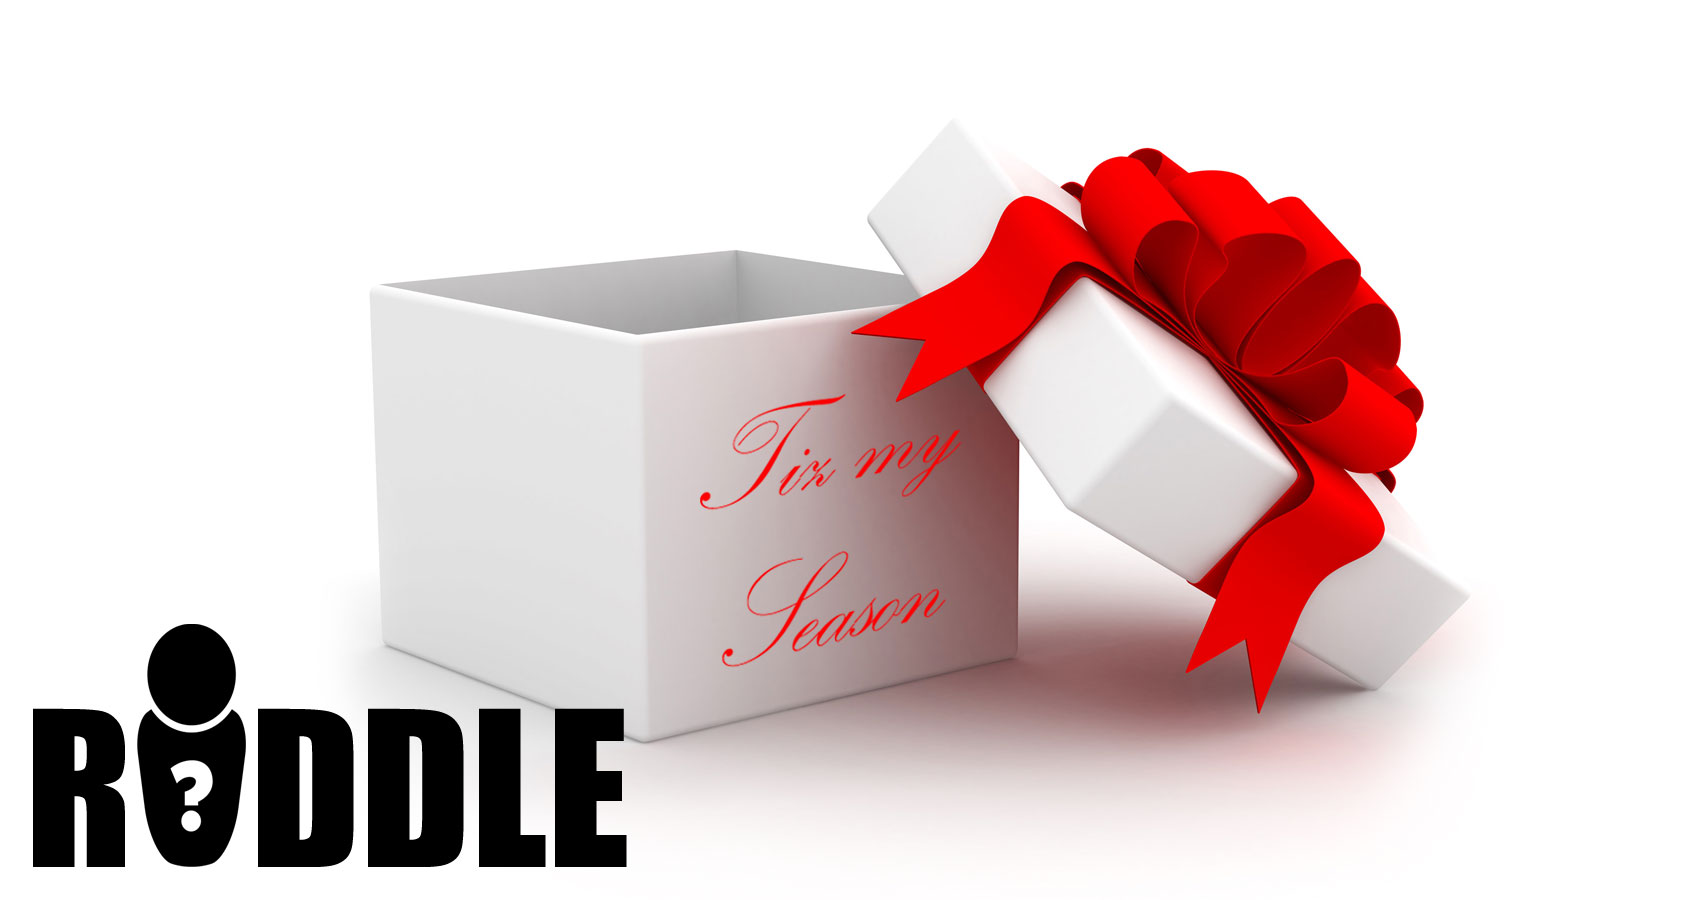 Tiz my Season written riddle by Liam Ward at Spillwords.com